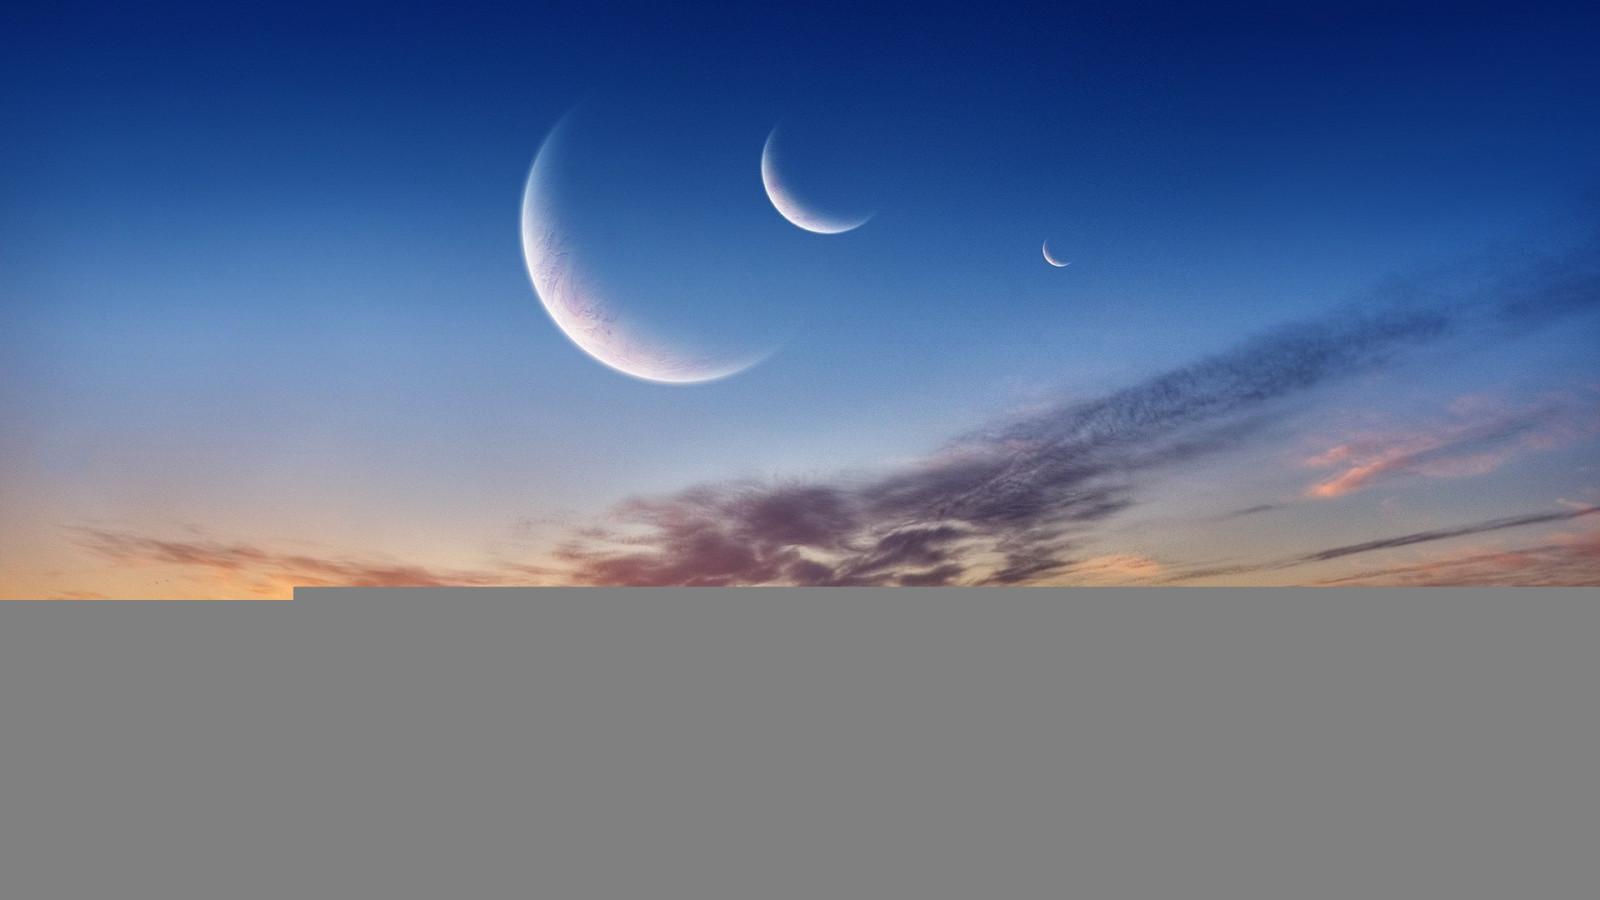 Wallpaper : pemandangan, langit, suasana, garis, 1920x1080